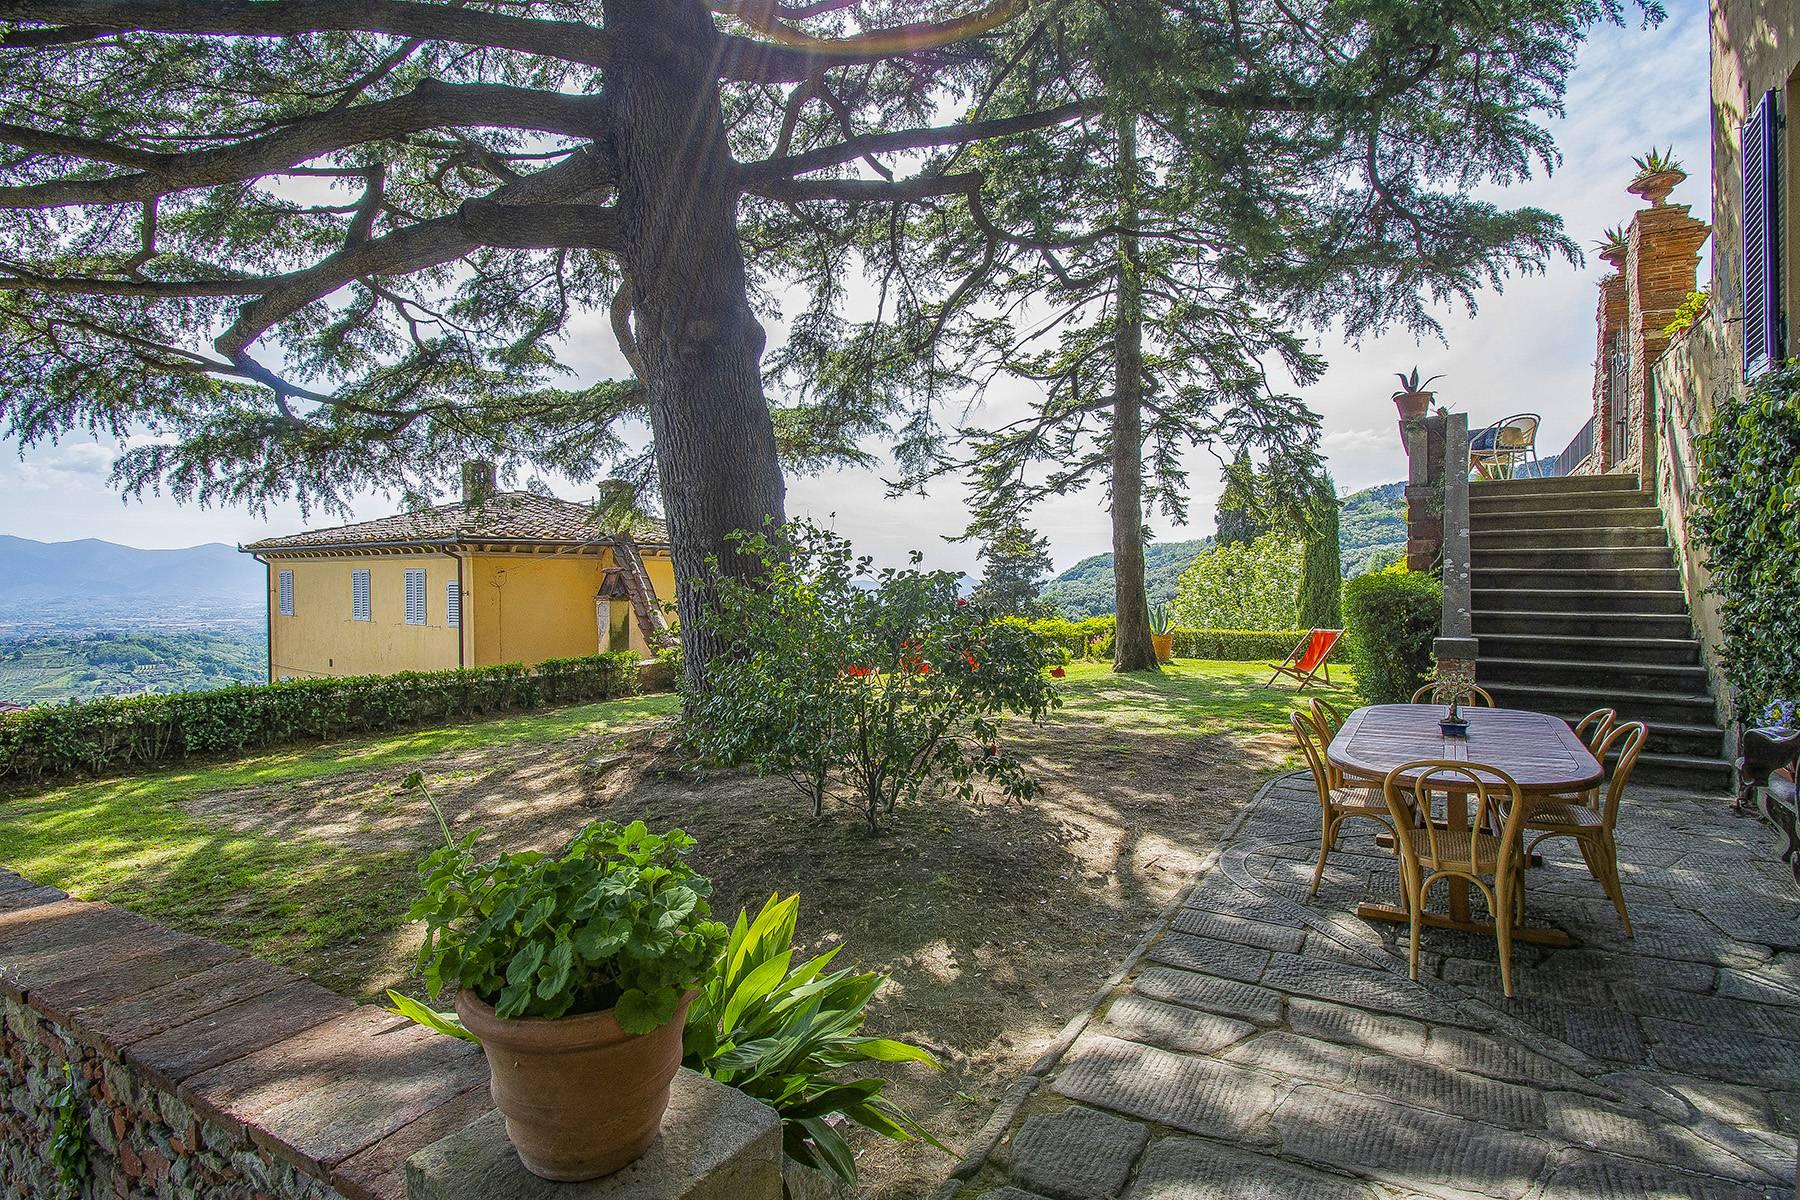 Villa in Vendita a Capannori: 5 locali, 380 mq - Foto 25